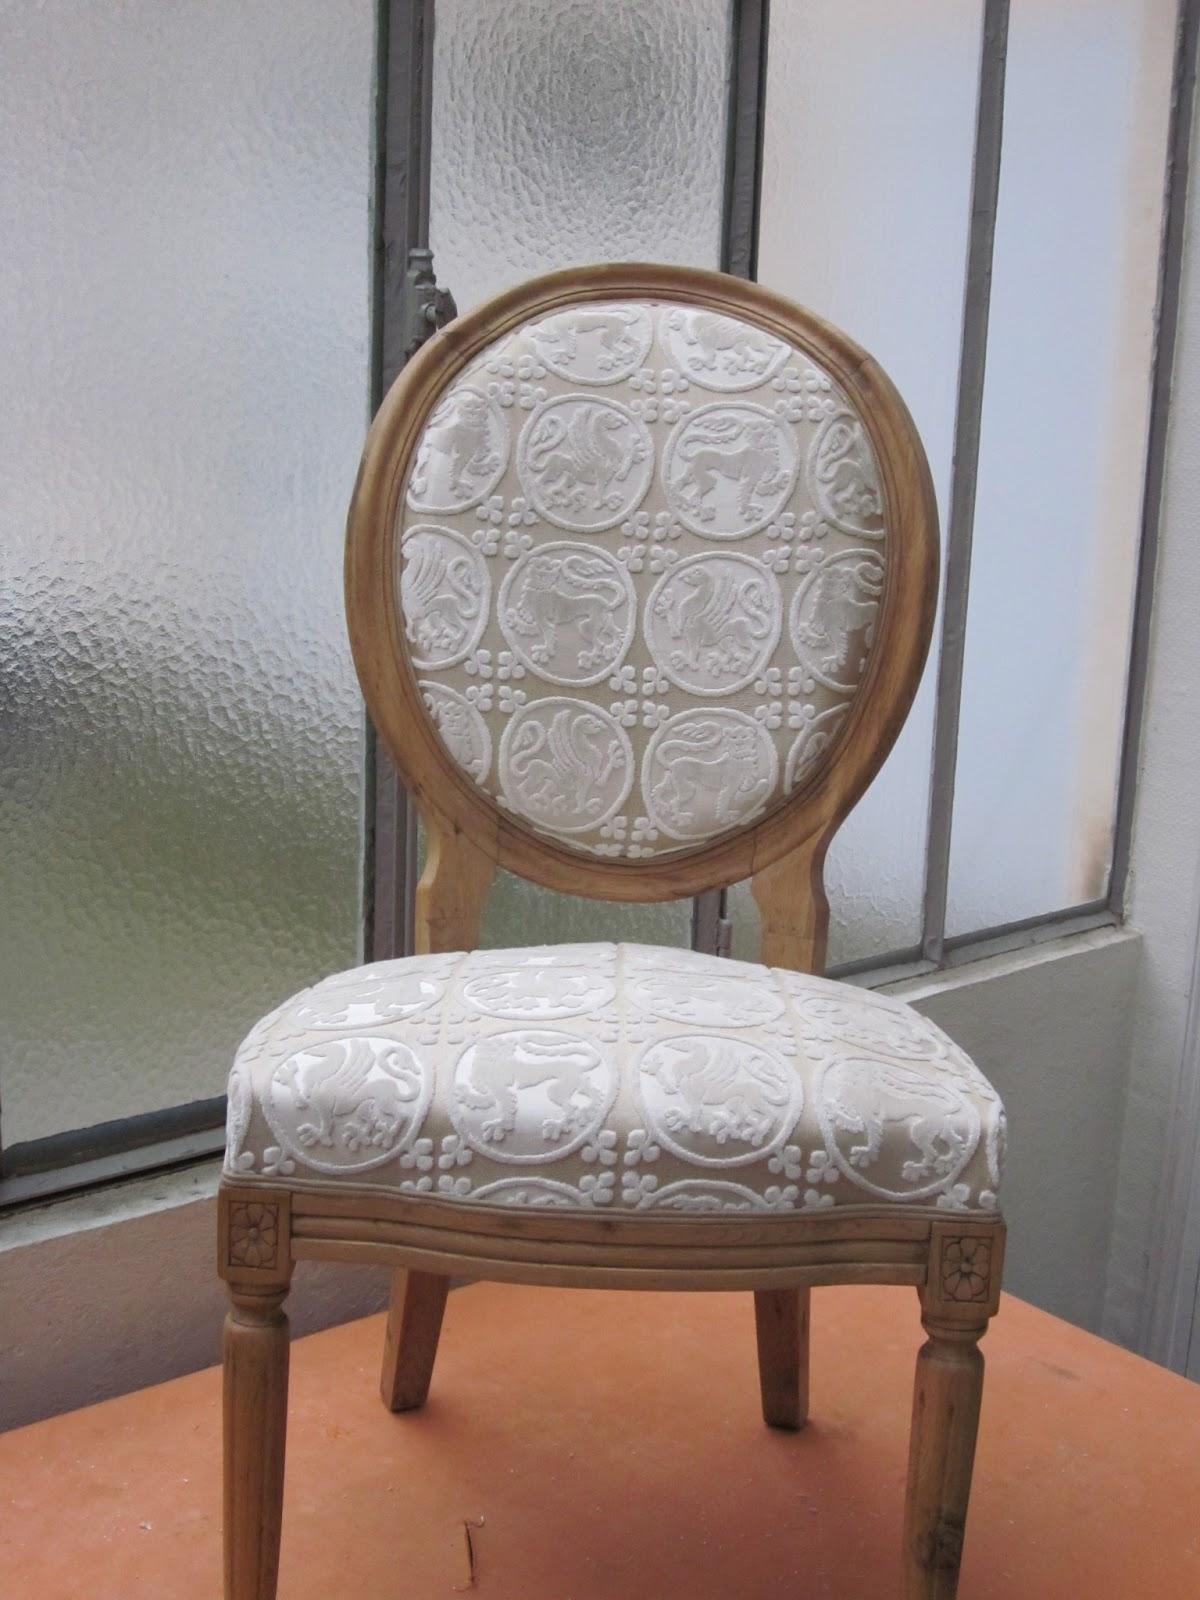 corine kern tapissier encore des chaises. Black Bedroom Furniture Sets. Home Design Ideas